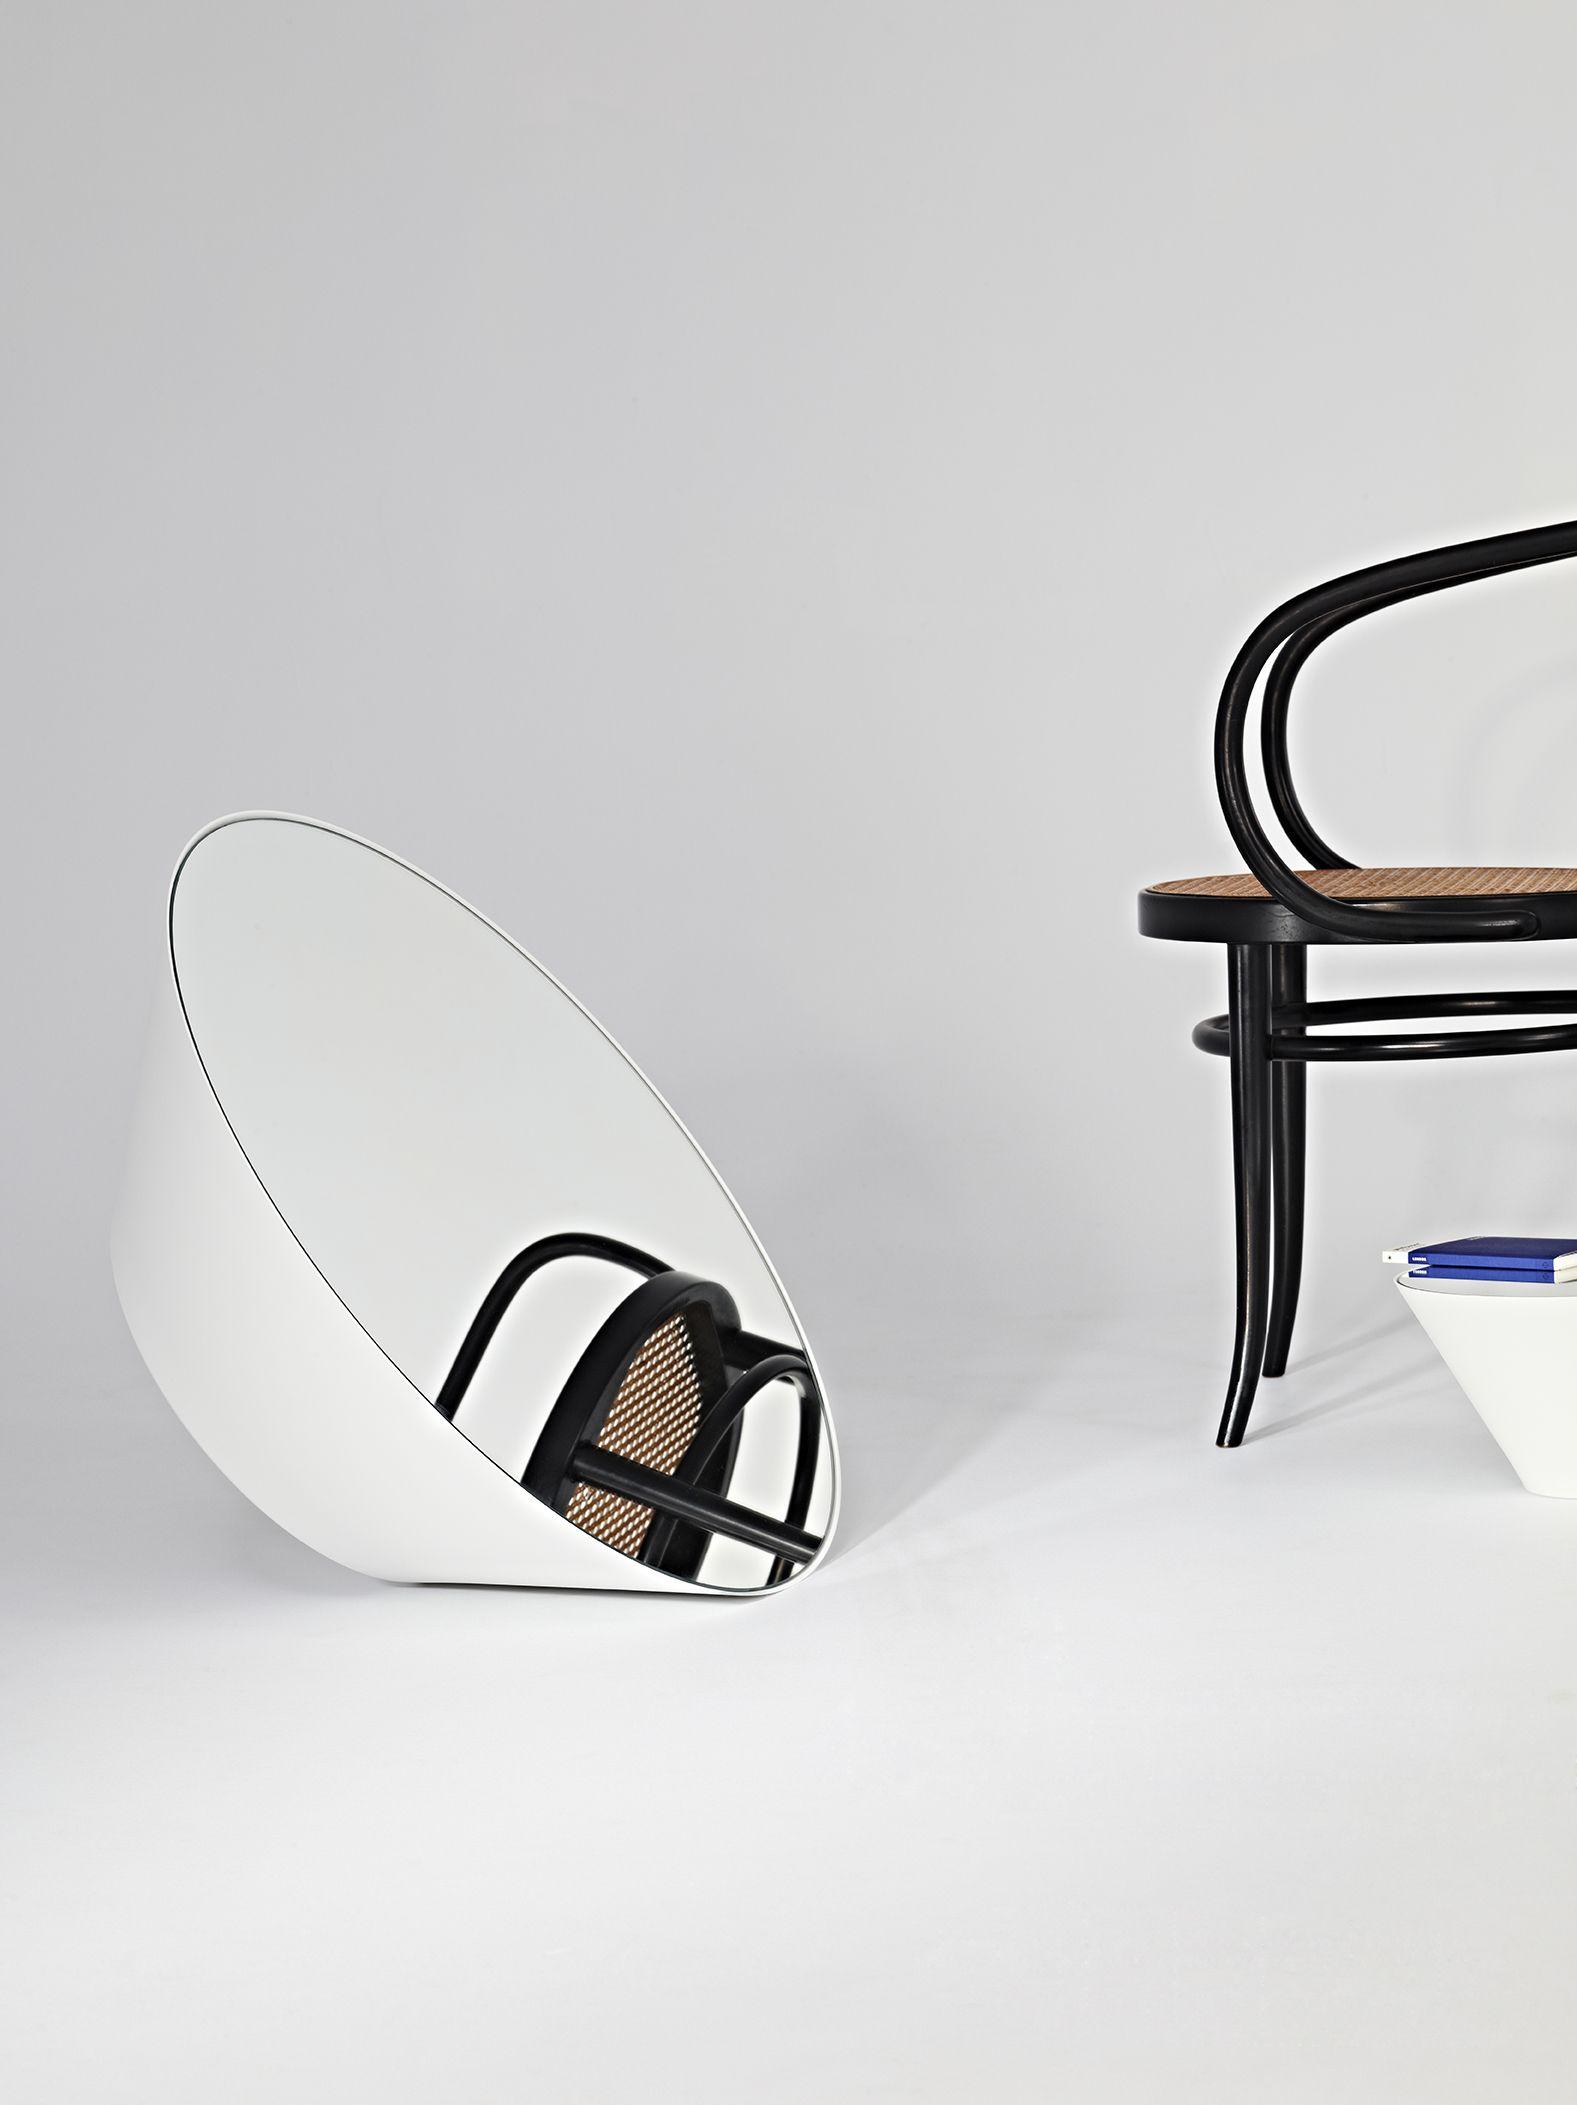 0d0def81bb8f03cfeed4ee768f390bde Incroyable De Table Basse En Verre Design Haut De Gamme Conception